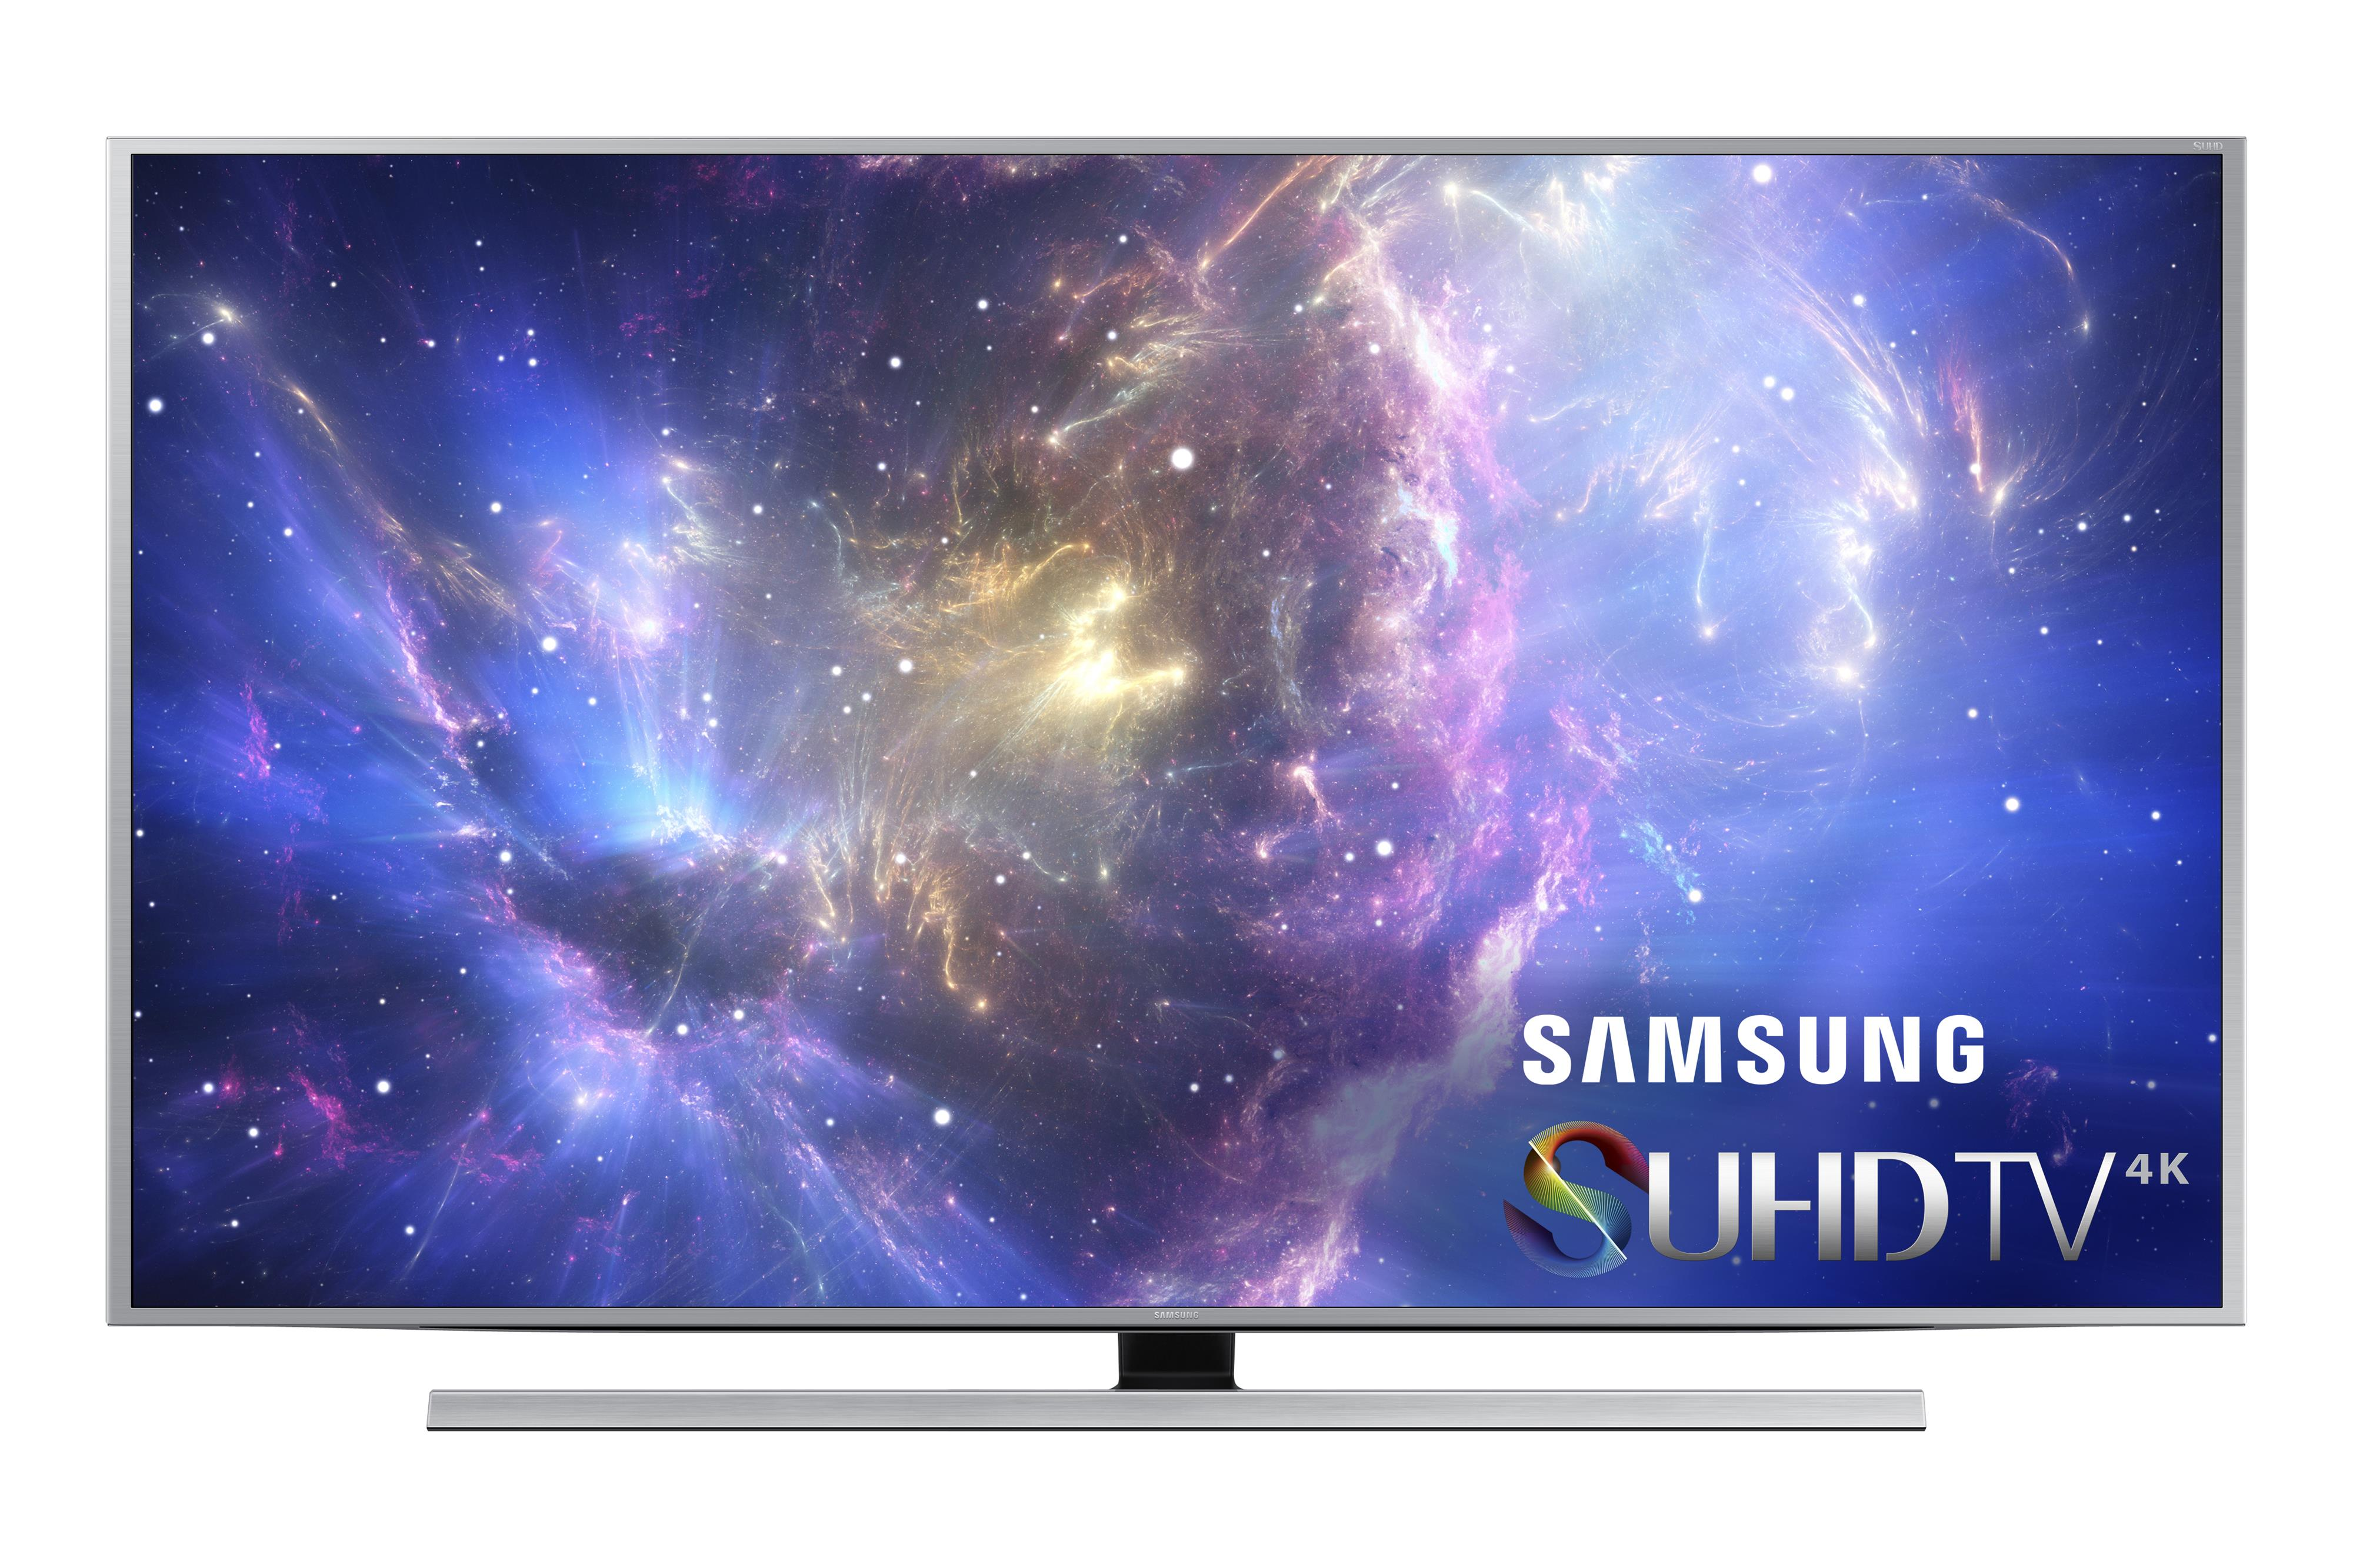 "Samsung Electronics Samsung LED TVs 2015 55"" 4K SUHD JS8500 Smart TV - Item Number: UN55JS8500FXZA"